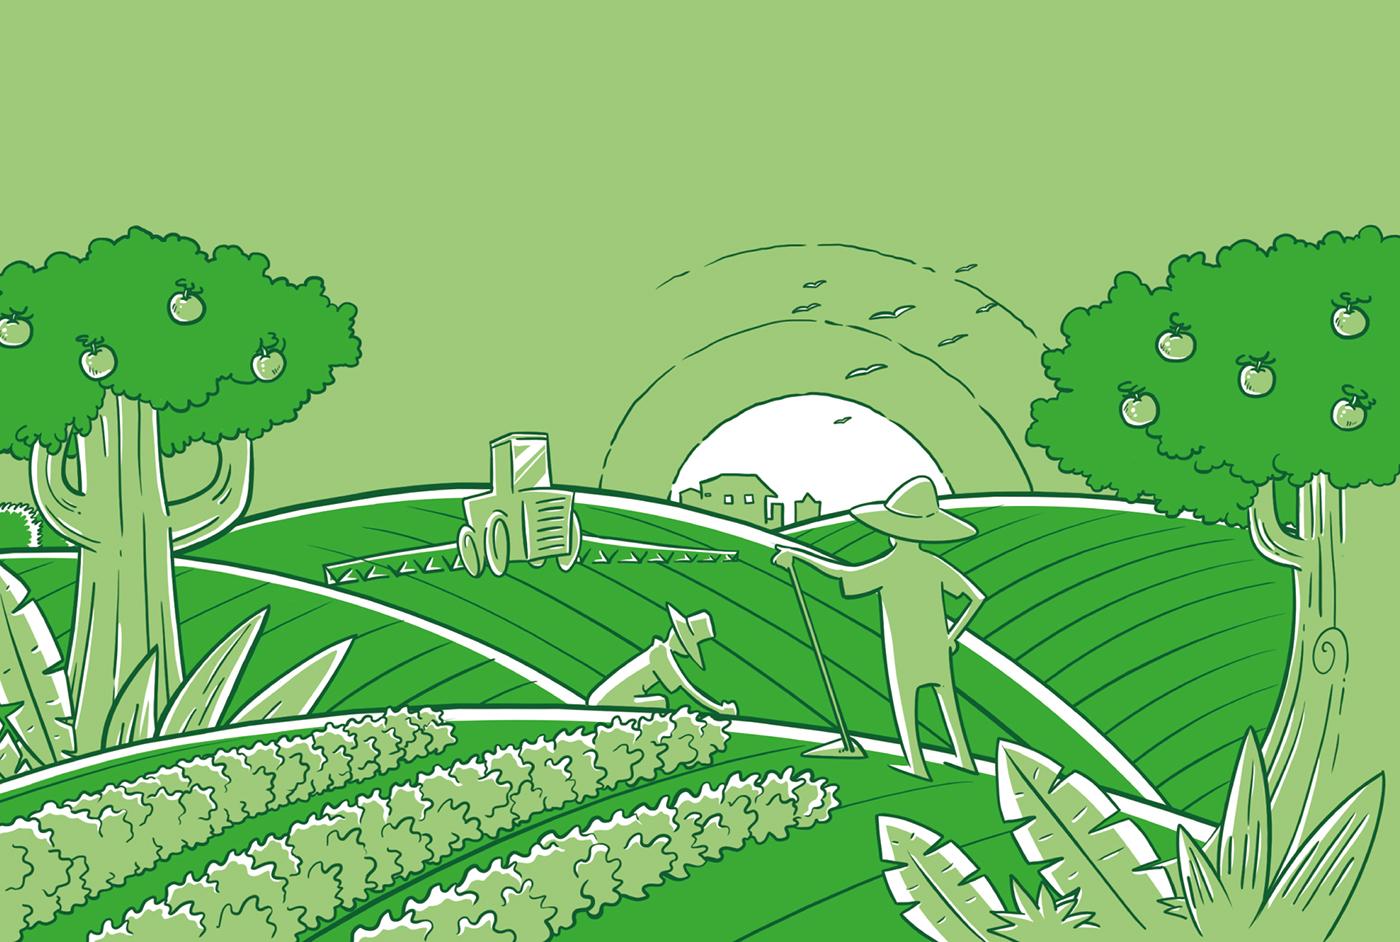 design Packaging fertilizante Fertilizer agroindustry Agro